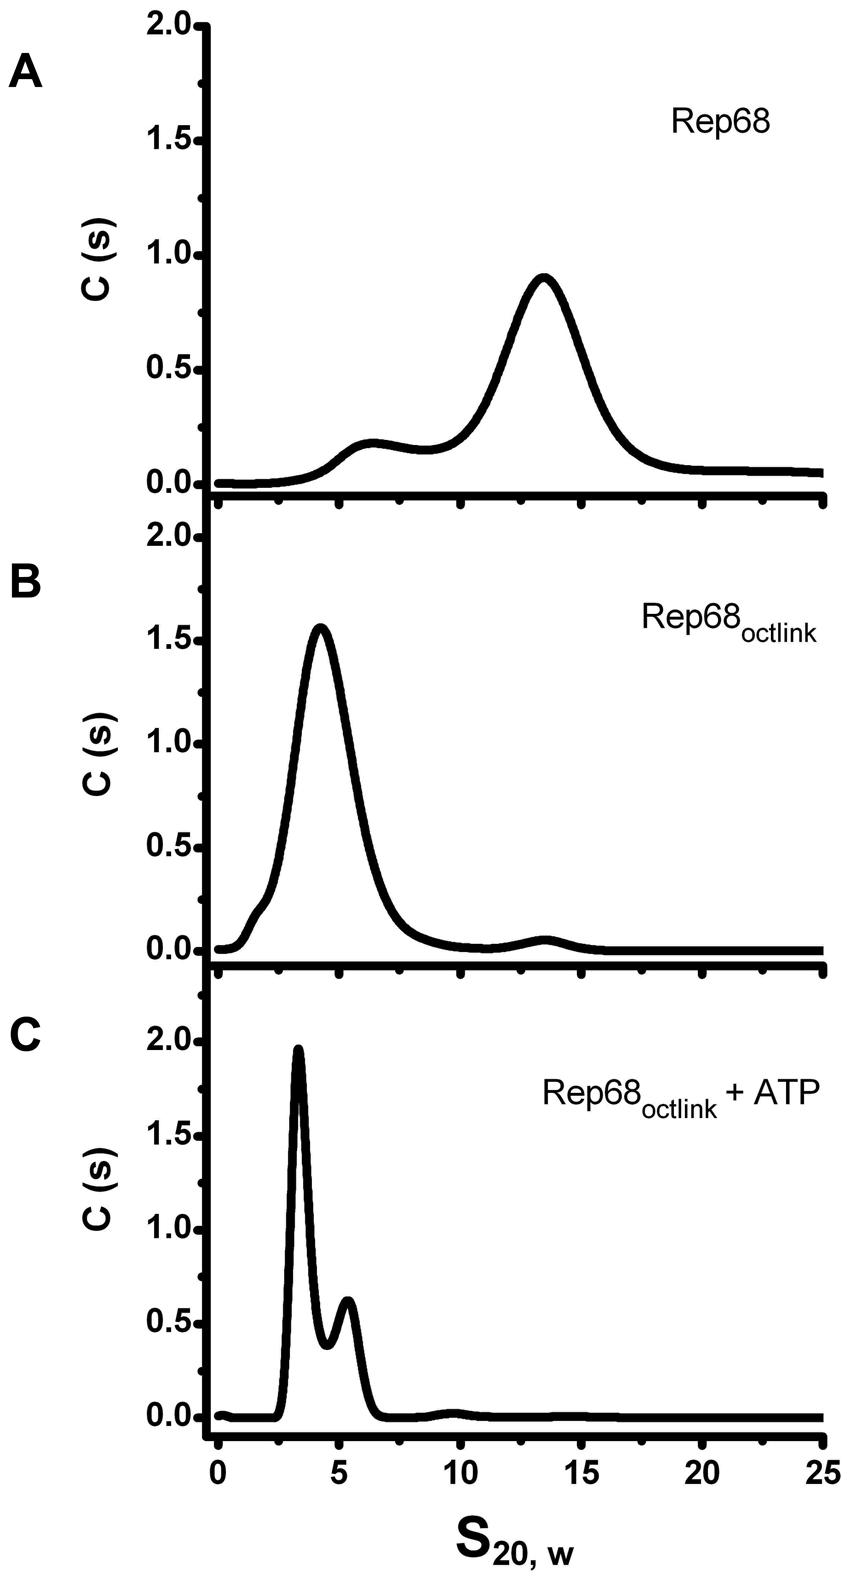 Effect of Linker replacement in Rep68 oligomerization.